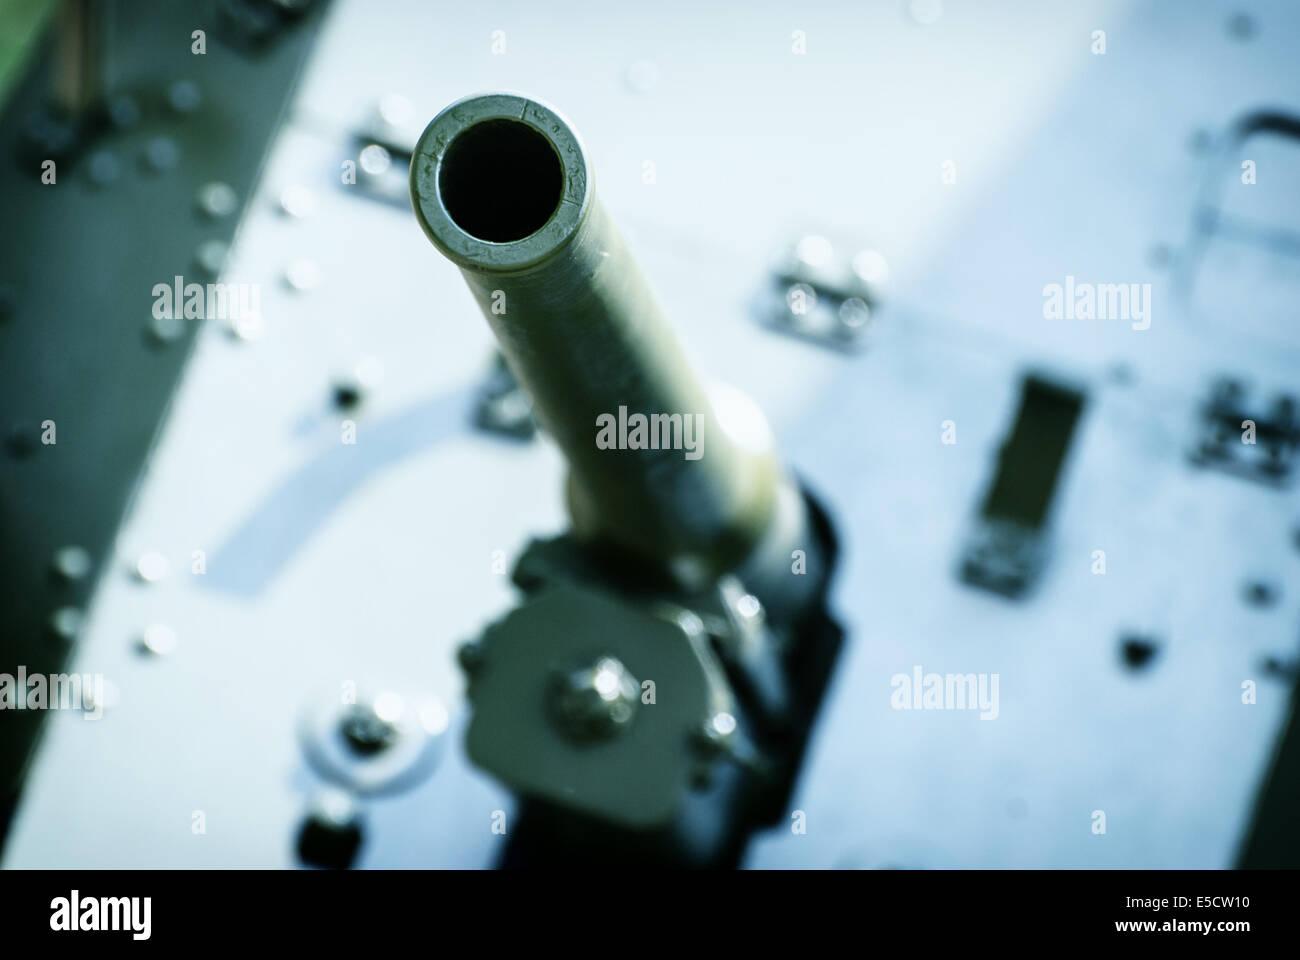 Detail of the german machine gun of World War II. - Stock Image